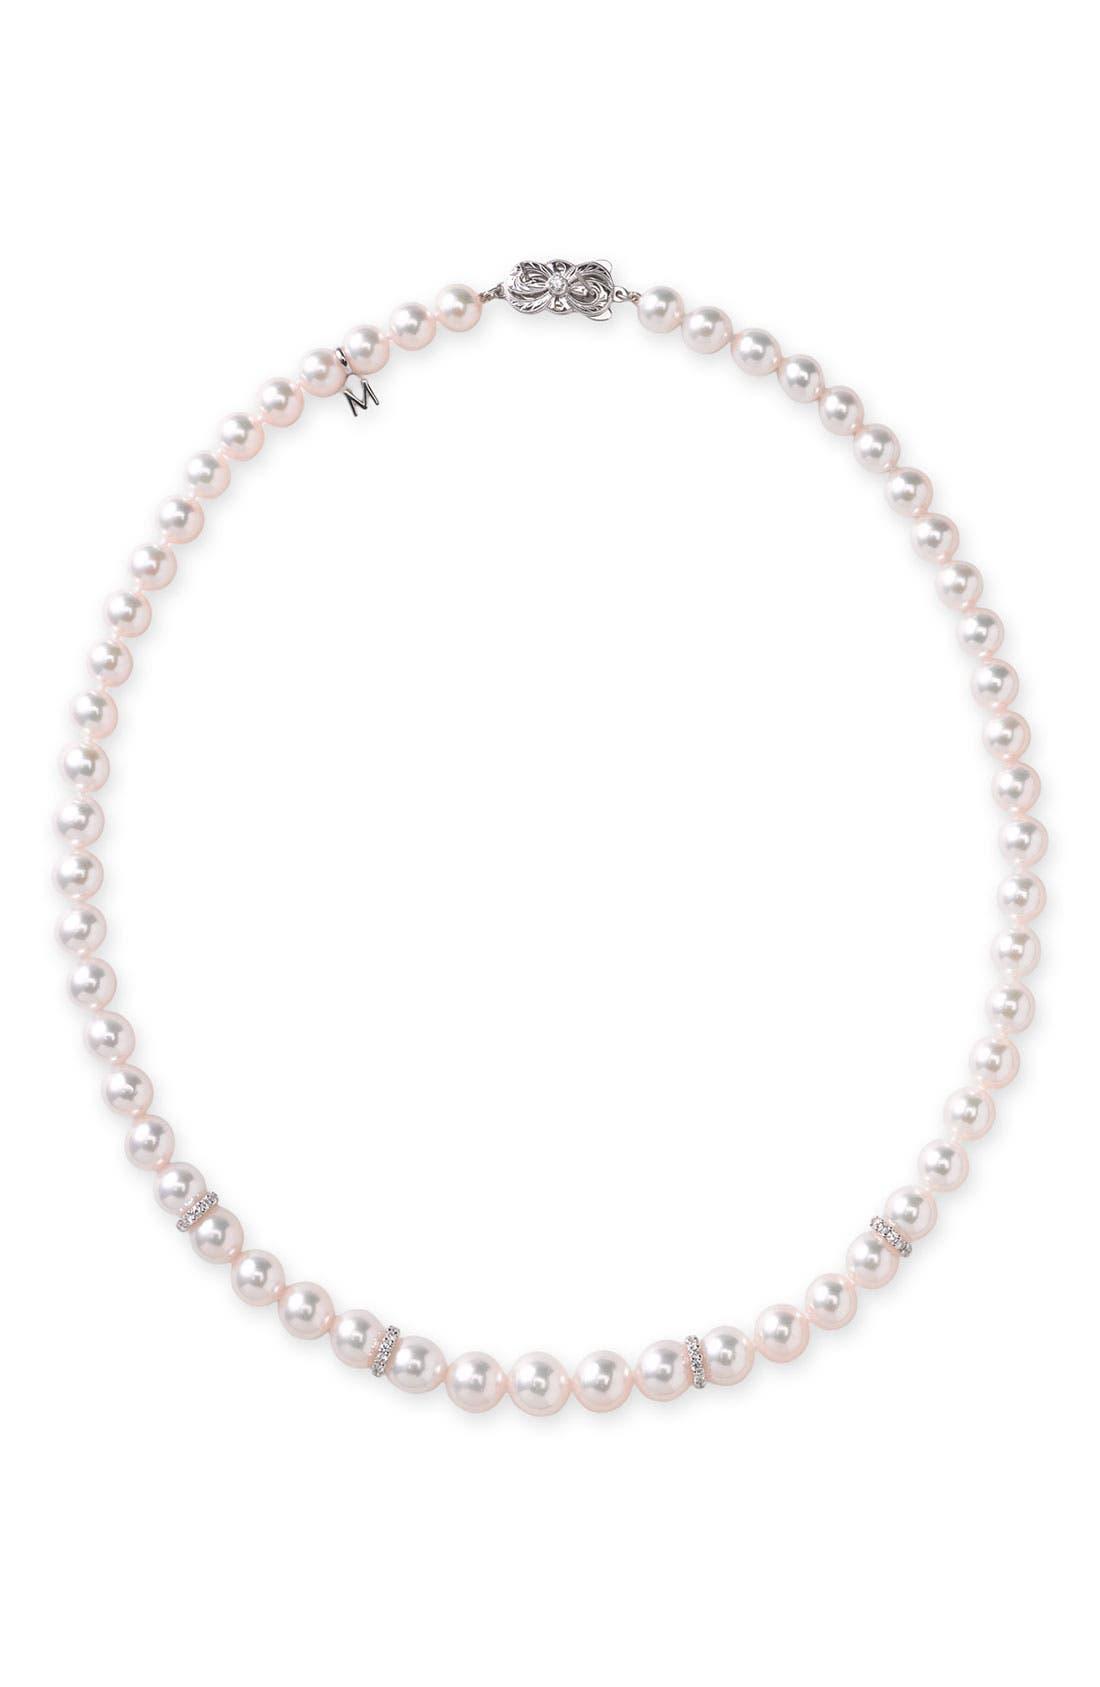 Diamond & Pearl Necklace